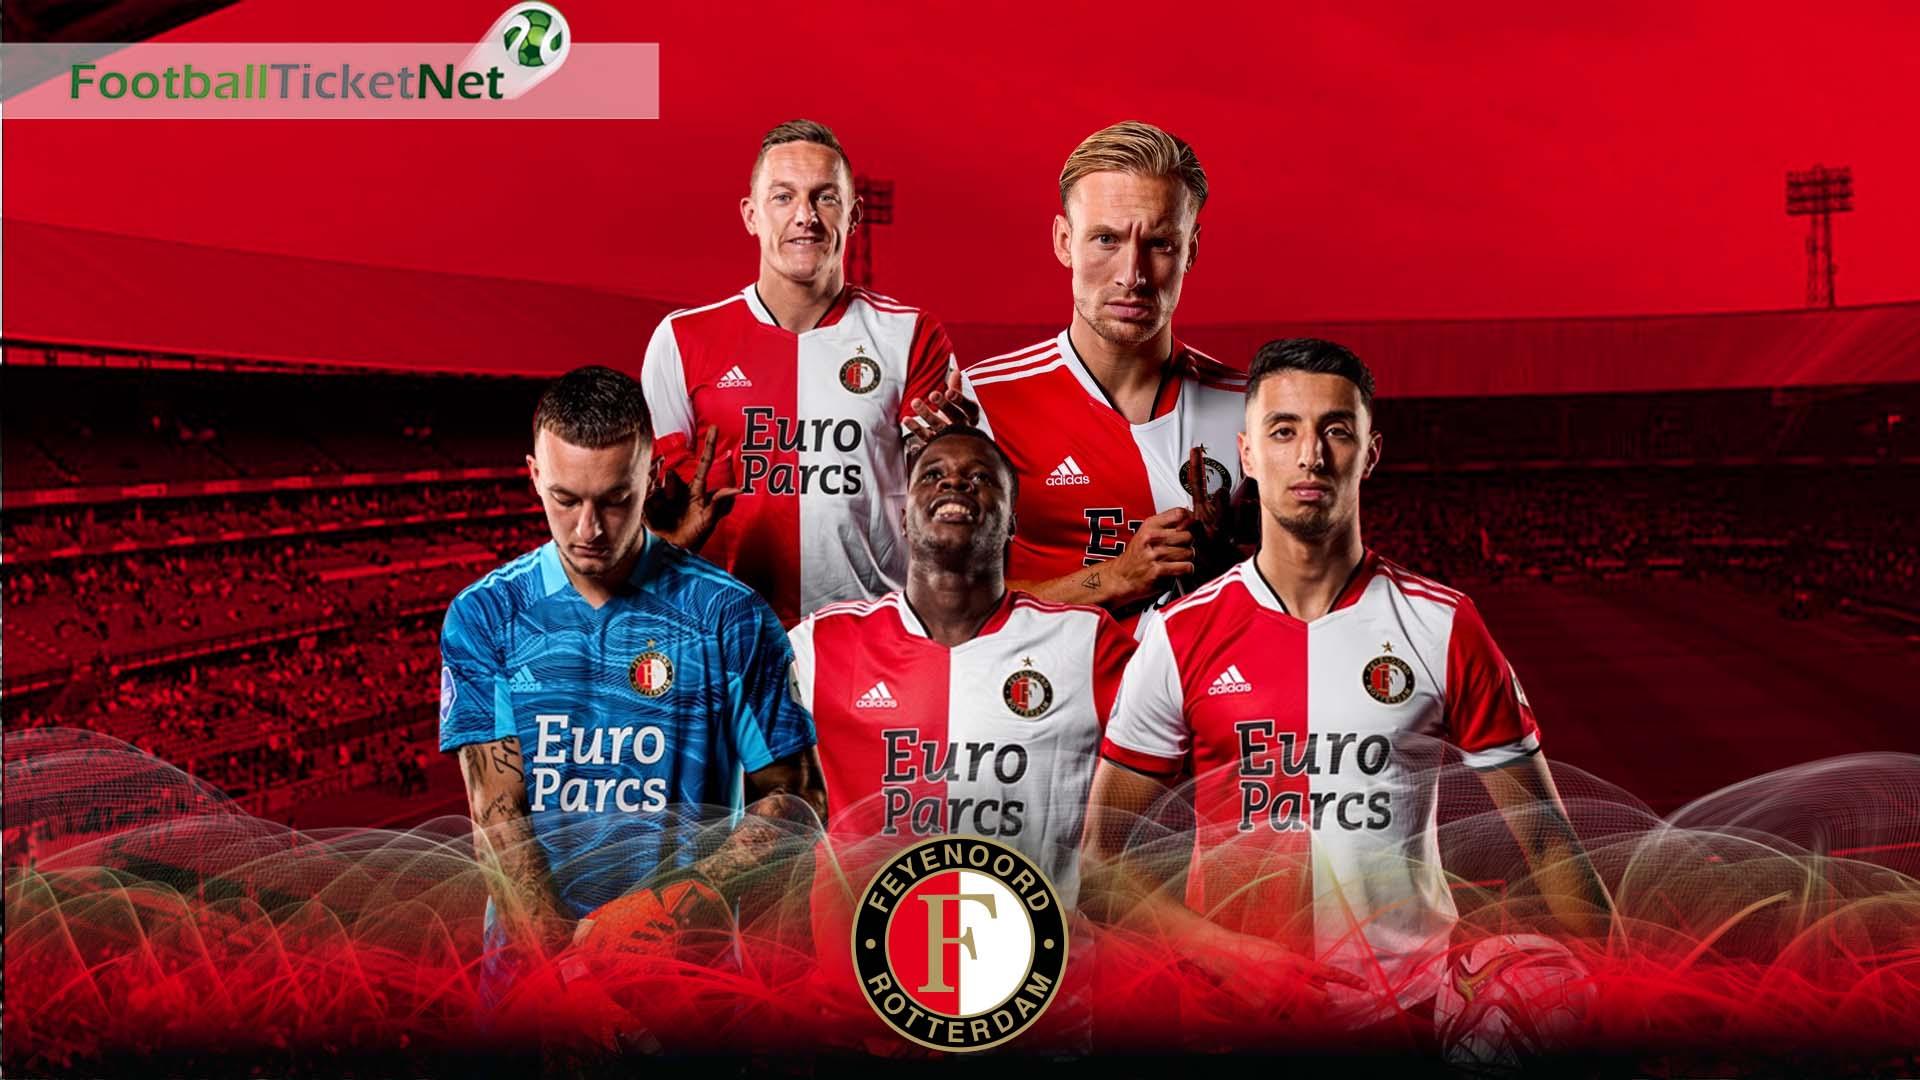 http://www.footballticketnet.com/files/images/teams/Buy-Feyenoord-Football-Tickets-FootballTicketNet.png